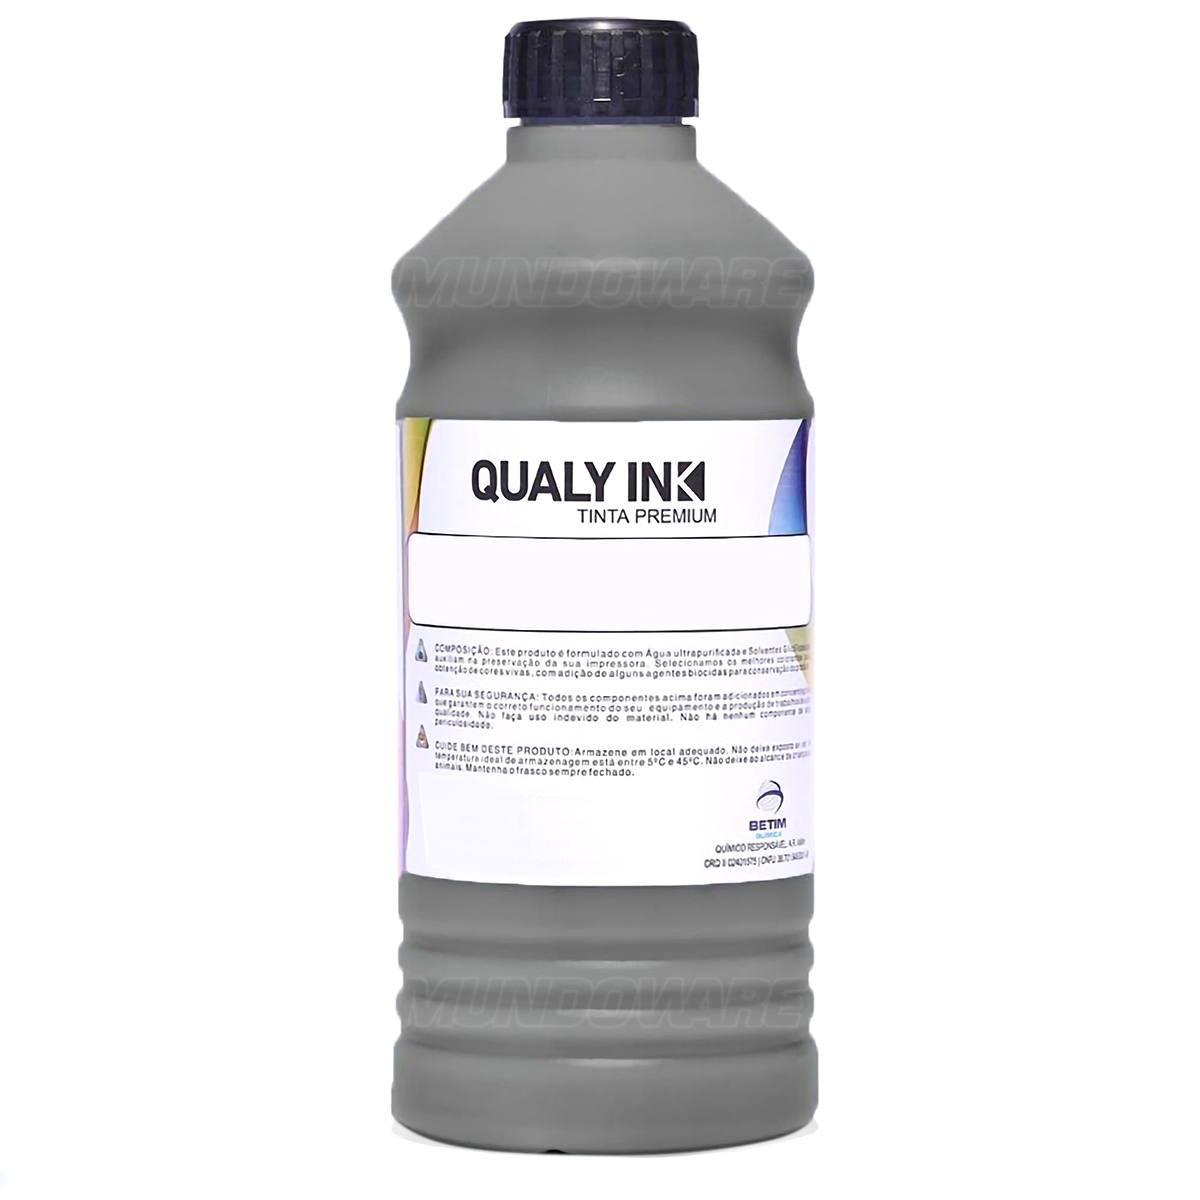 Tinta Corante Qualy-Ink para Impressora Brother MFC-J6710dw J6520dw J6720dw J6920dw 6490cw 6890cdw Preto Refil 1L